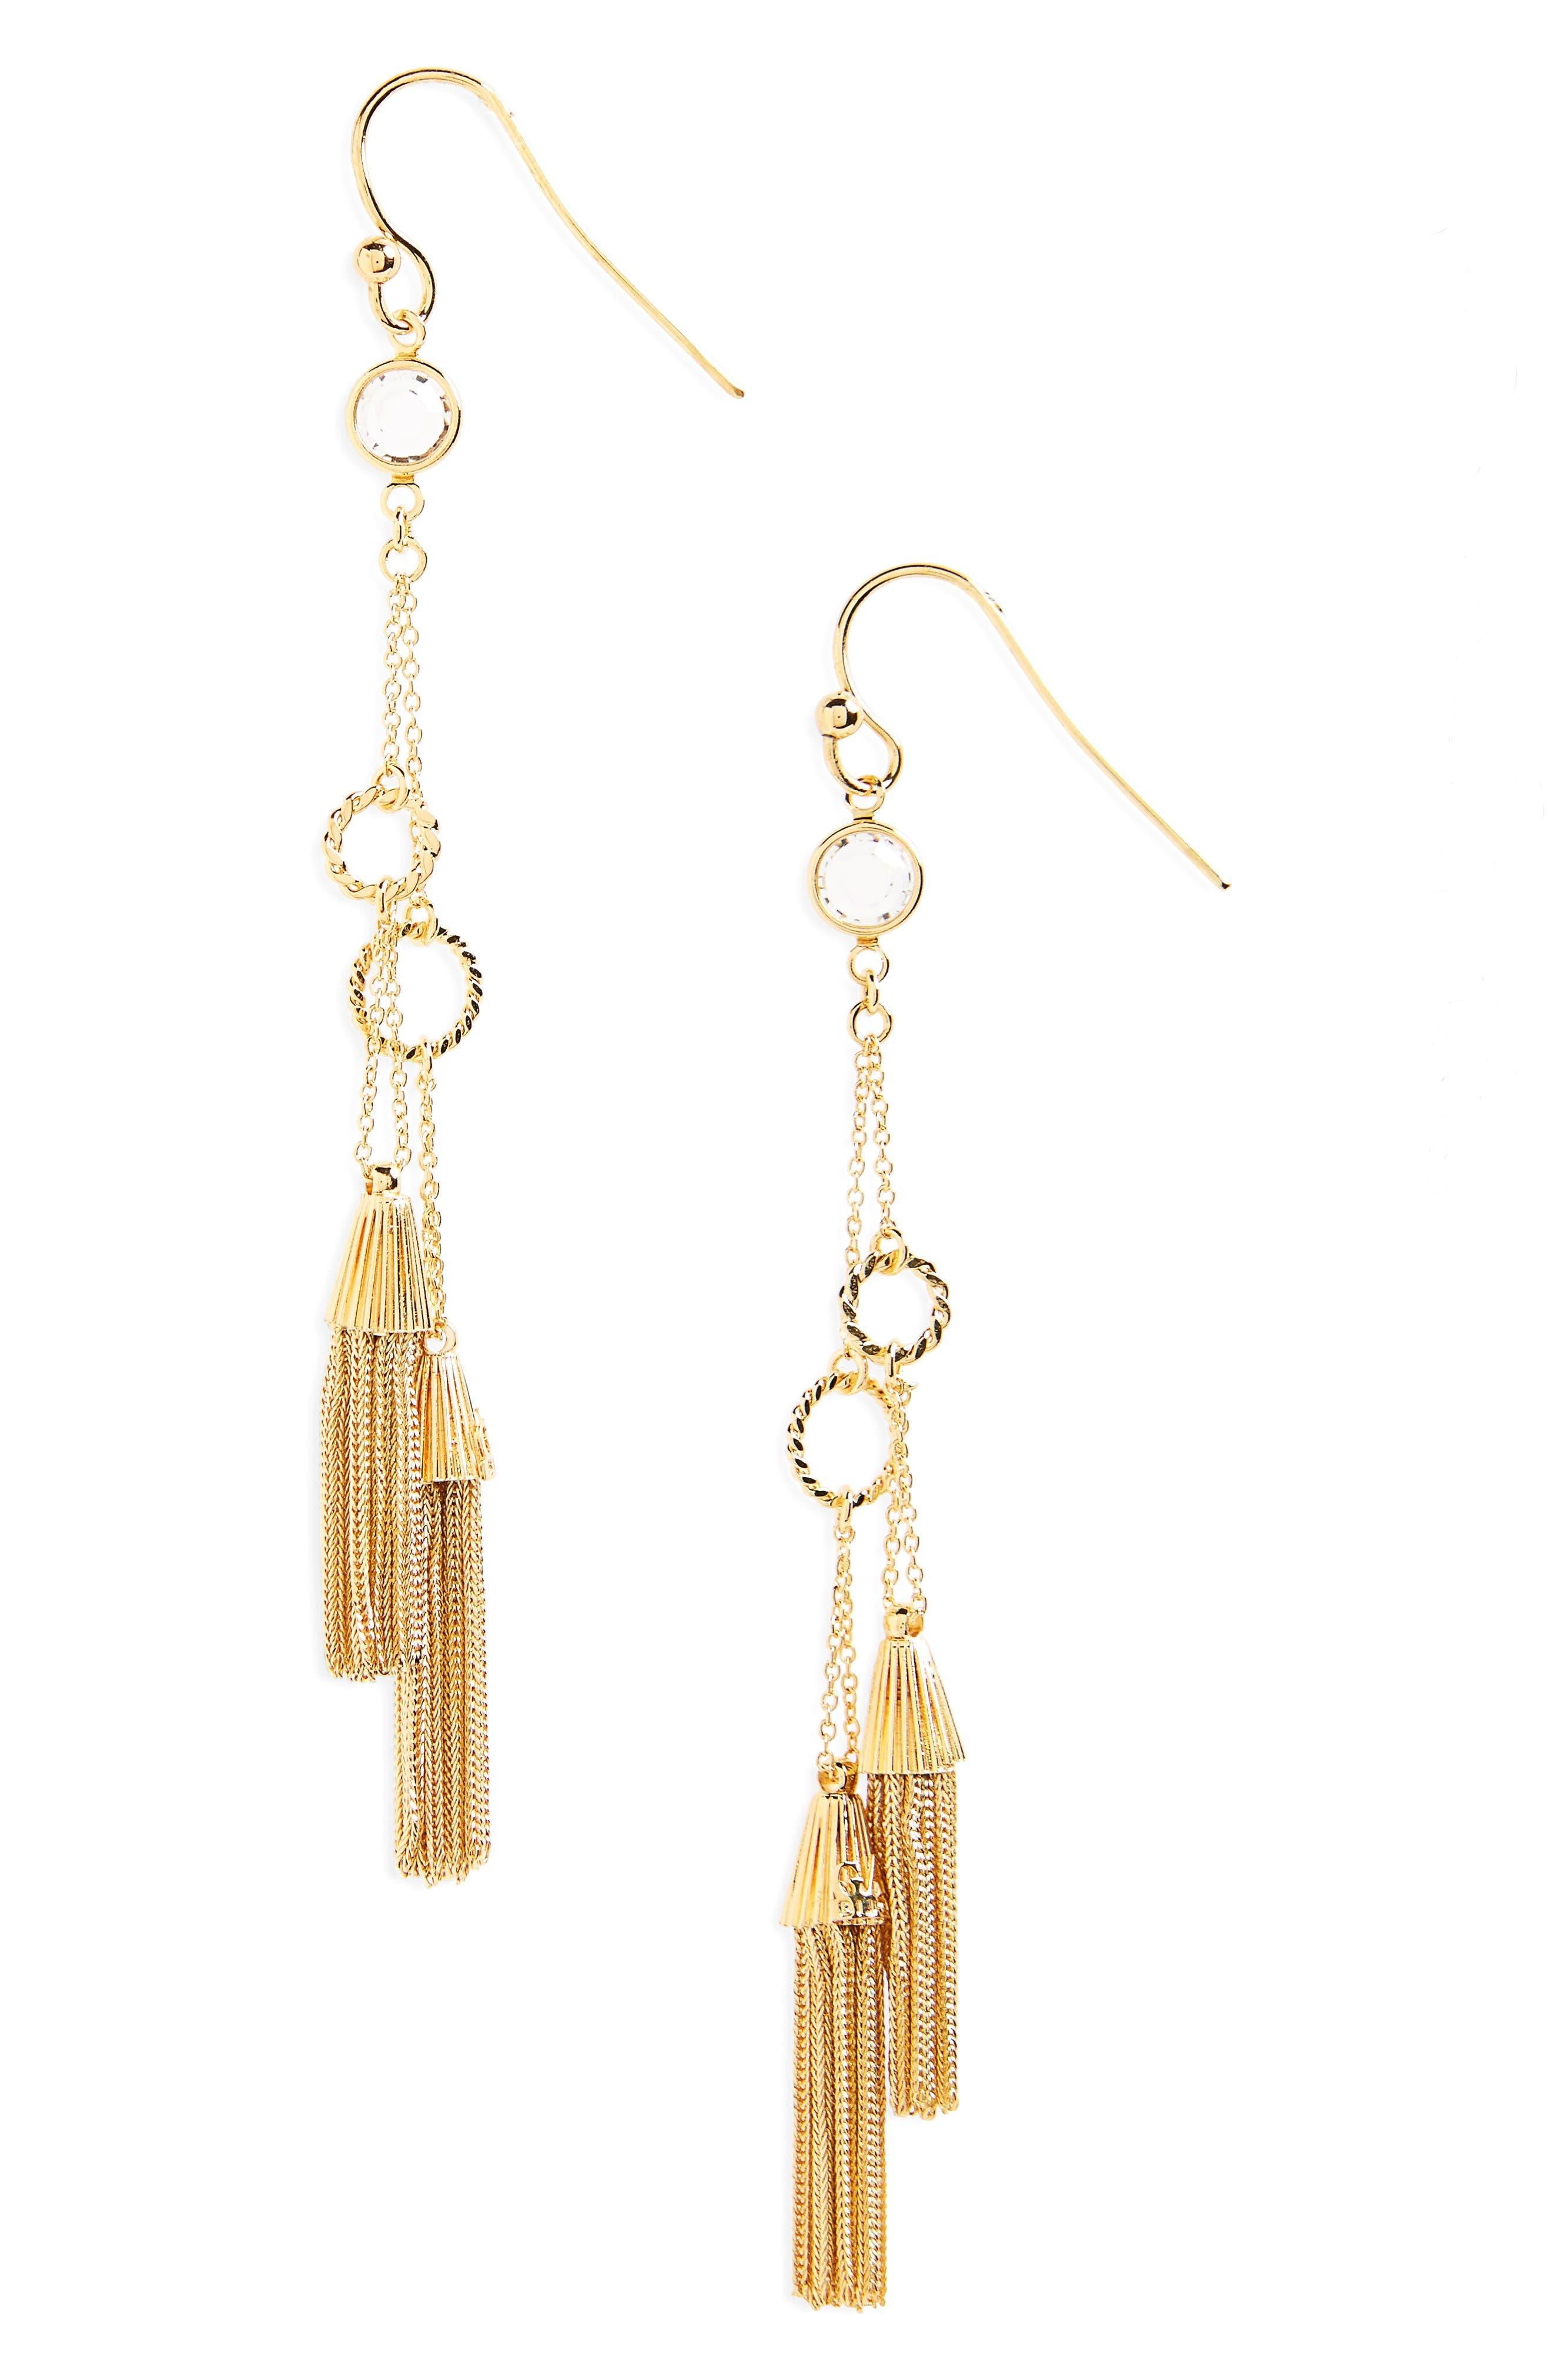 Tresse Tassels Shoulder Duster Earrings,                         Main,                         color, Gold